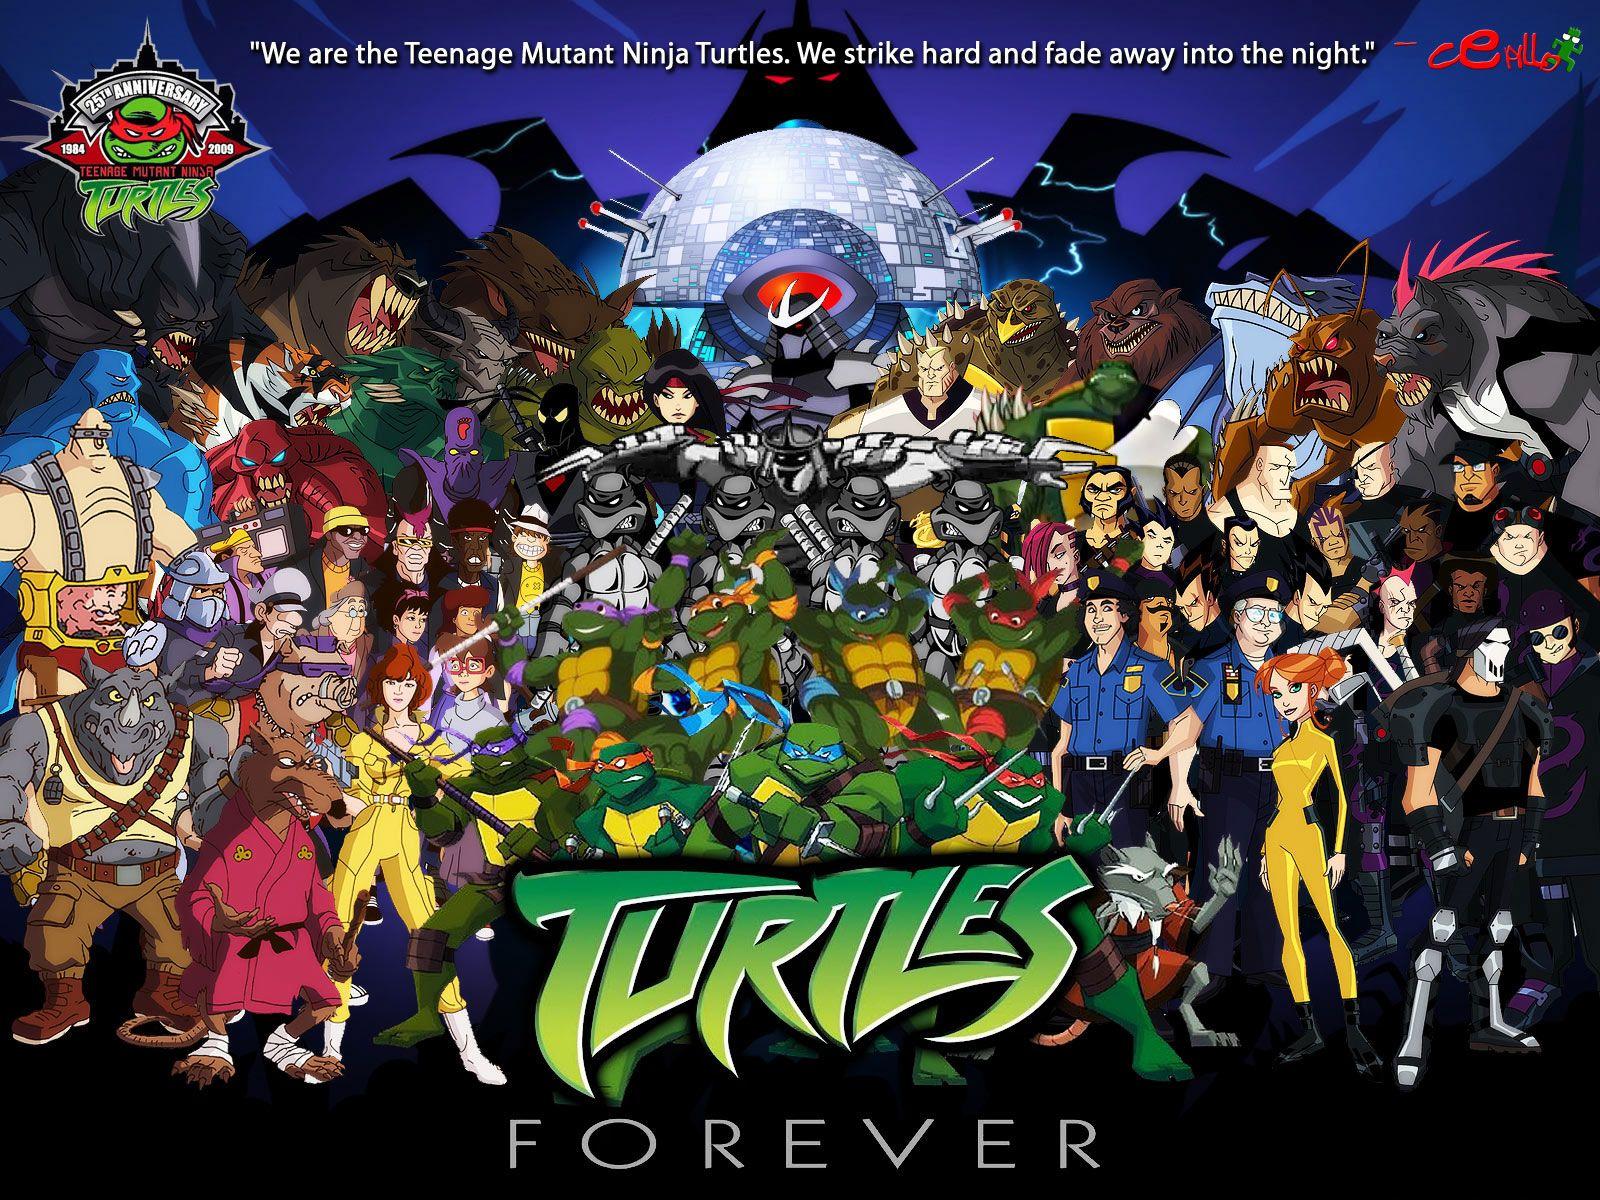 "2012 Michel-Ange Cycle 4/"" McDonalds #4 Teenage Mutant Ninja Turtles figure Teenage Mutant Ninja Turtles"